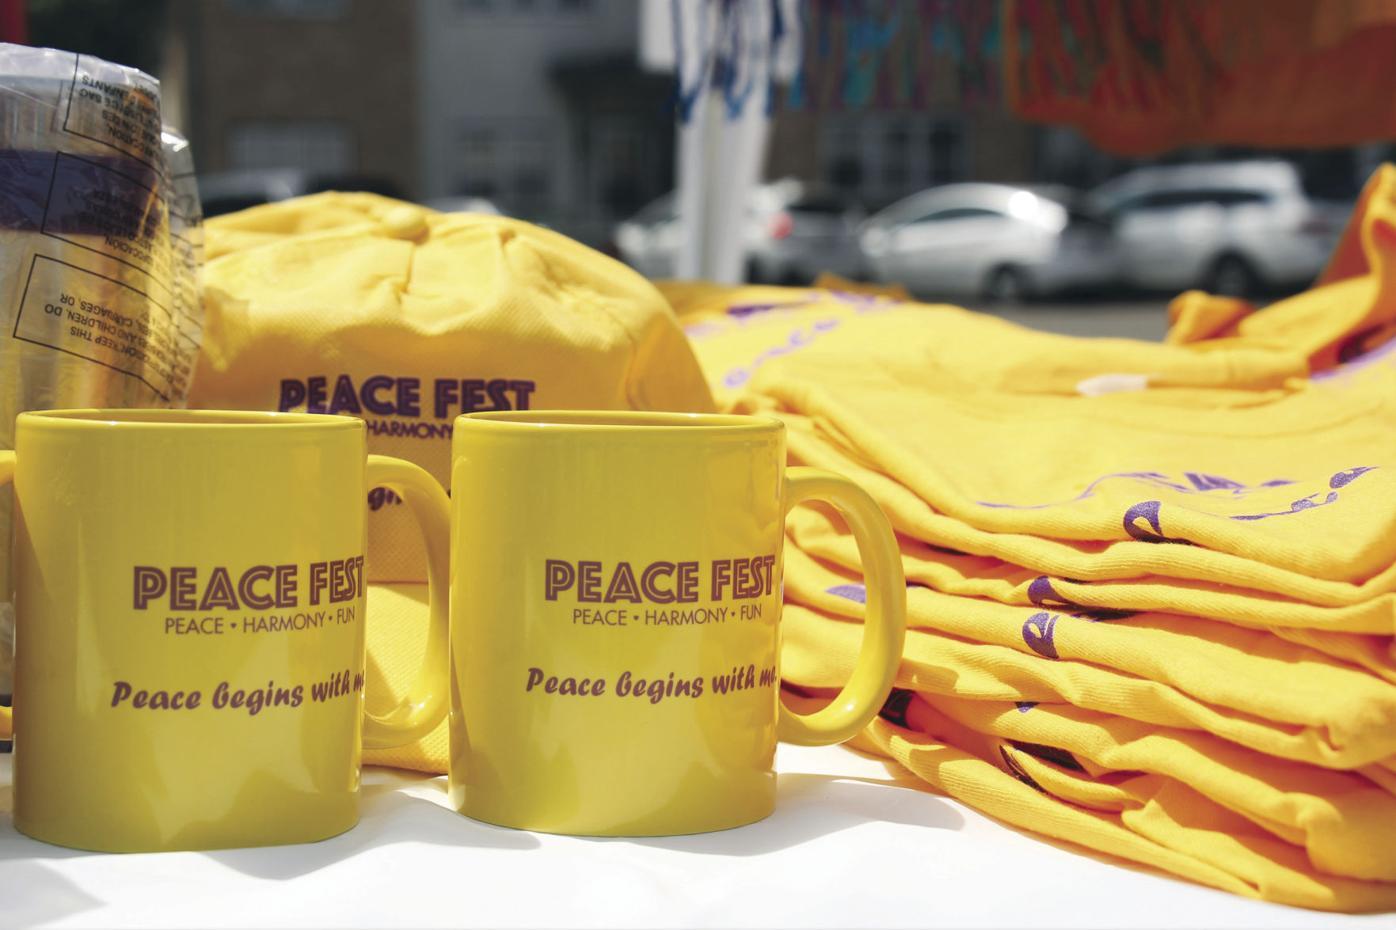 CH_peace fest_3.JPG